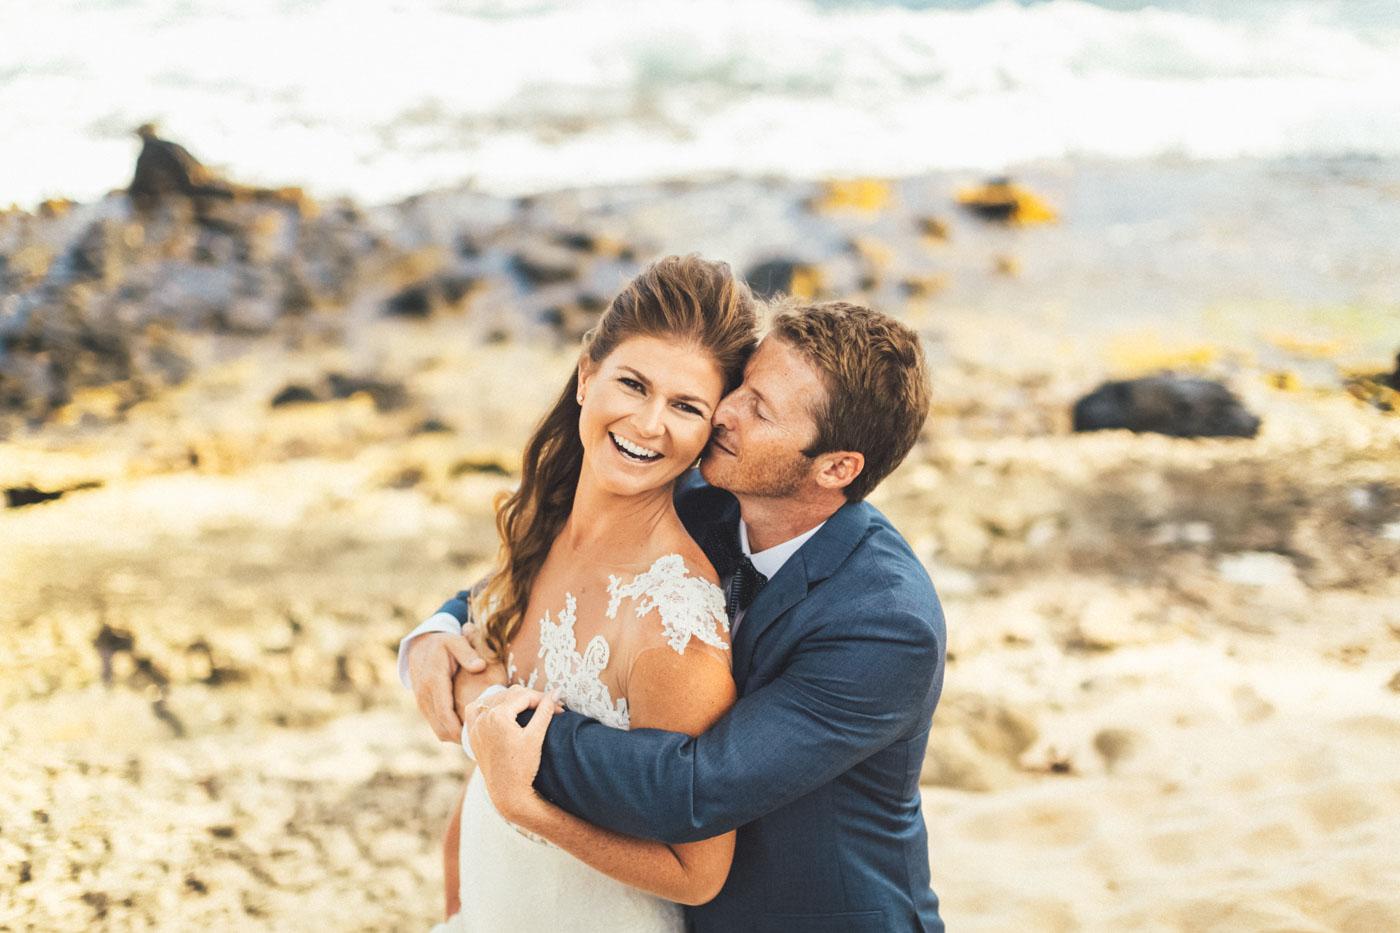 Bride and groom Kauai beach wedding first look